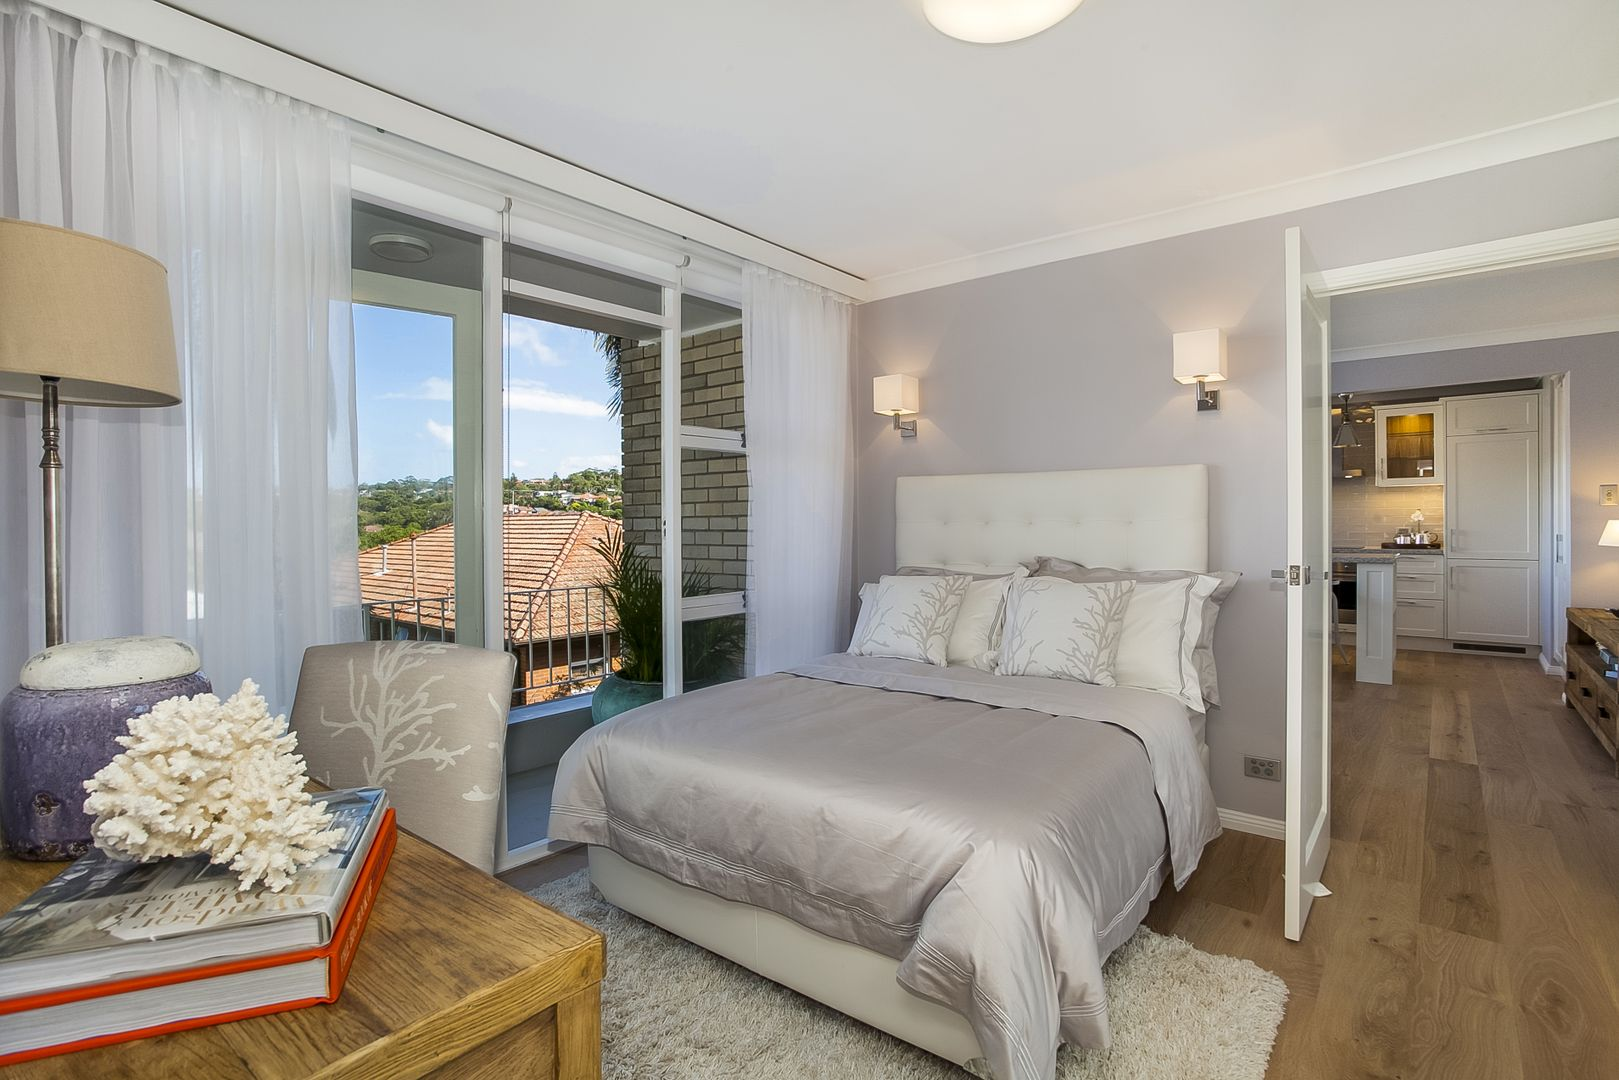 2/11 Boyle Street, Balgowlah NSW 2093, Image 2